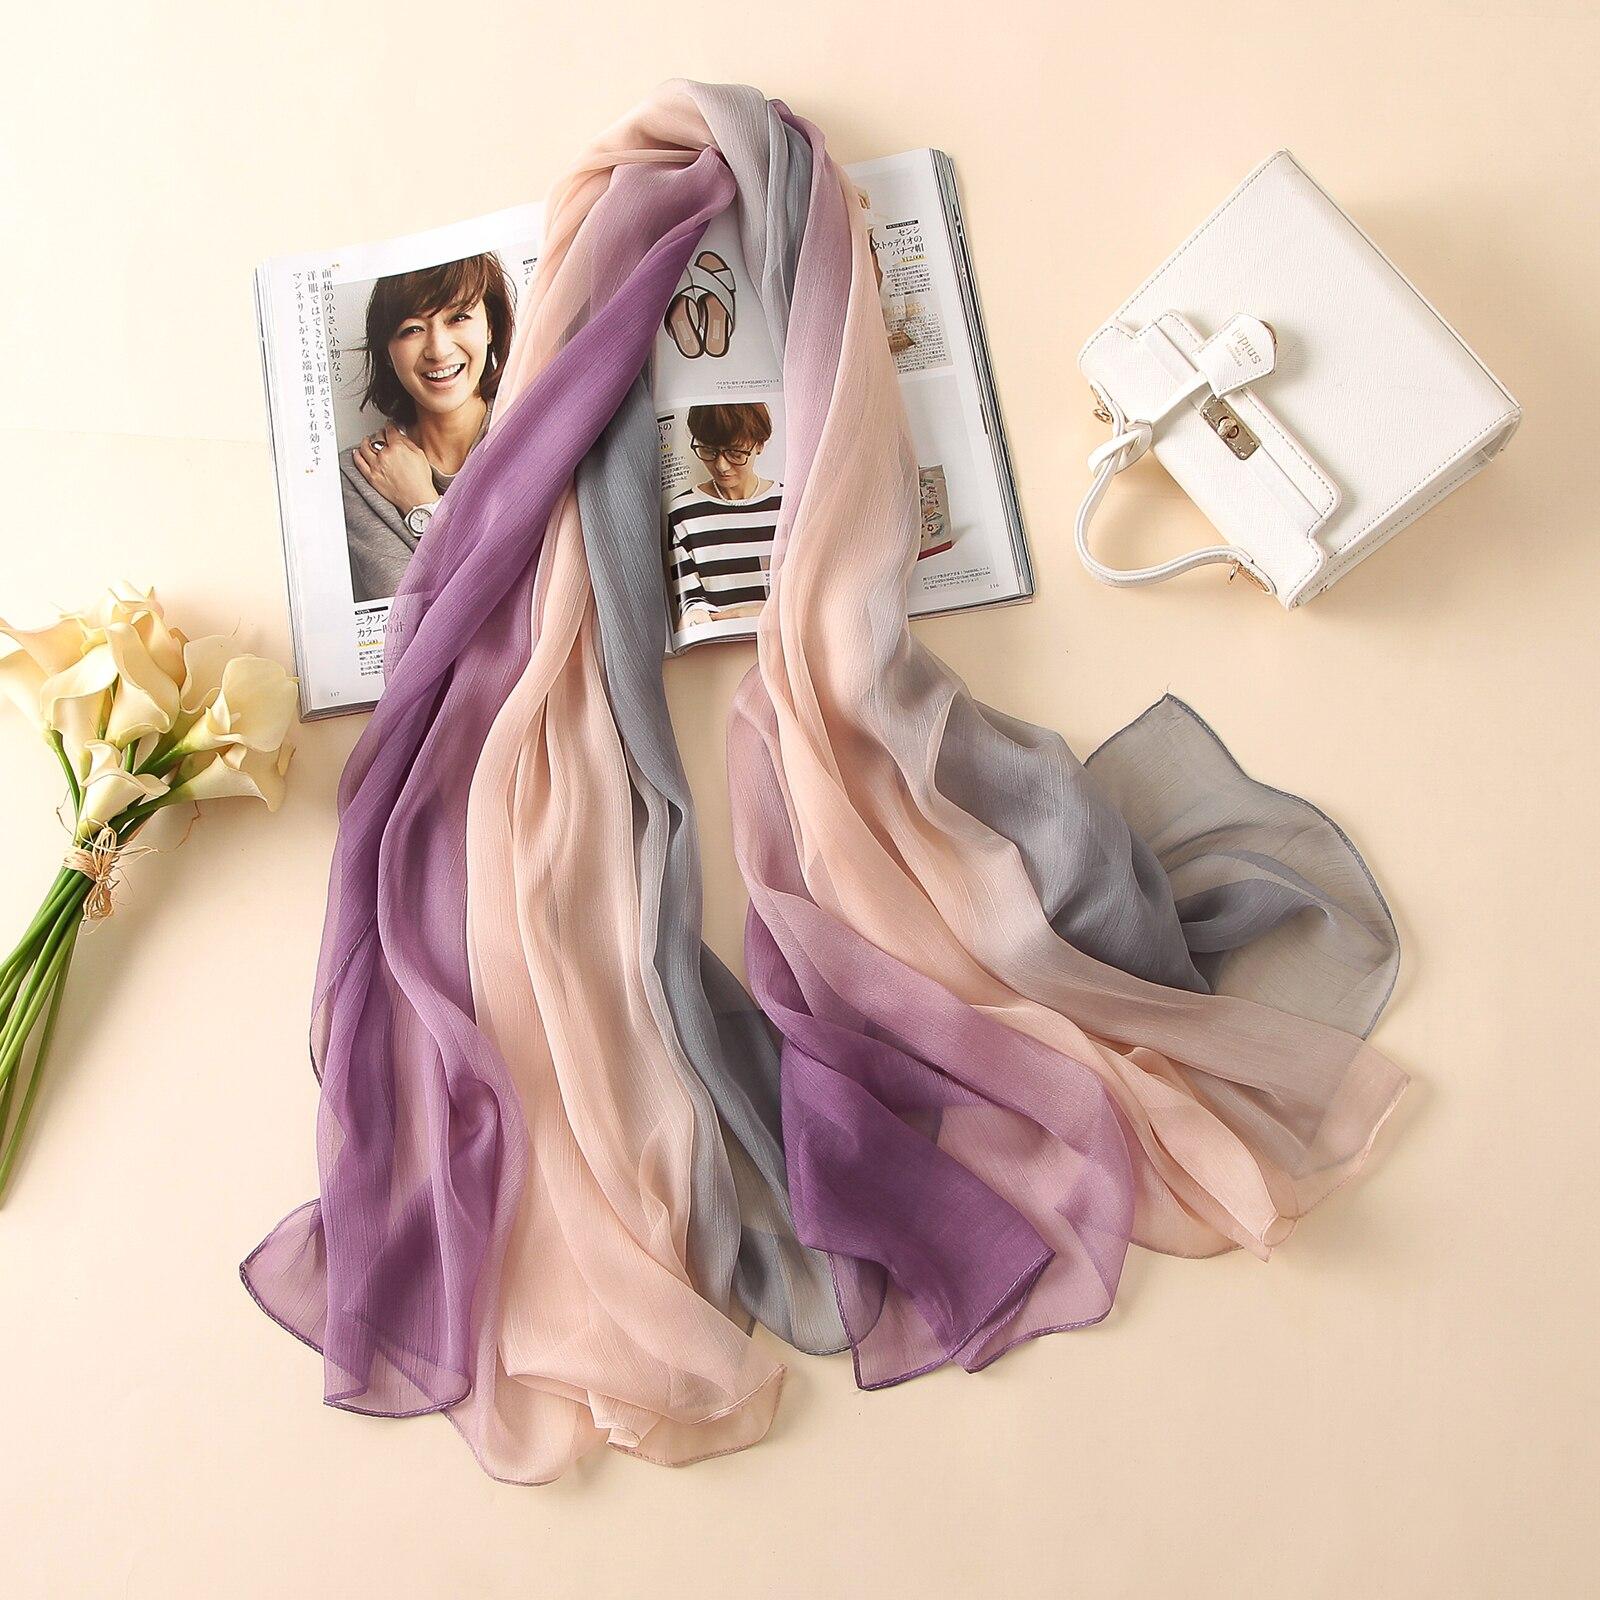 2018 sommar kvinnor halsduk mode mjuka Crepon godis färg silke halsdukar sjalar och pashmina lady caps kvinnliga bandanas stora Foulard